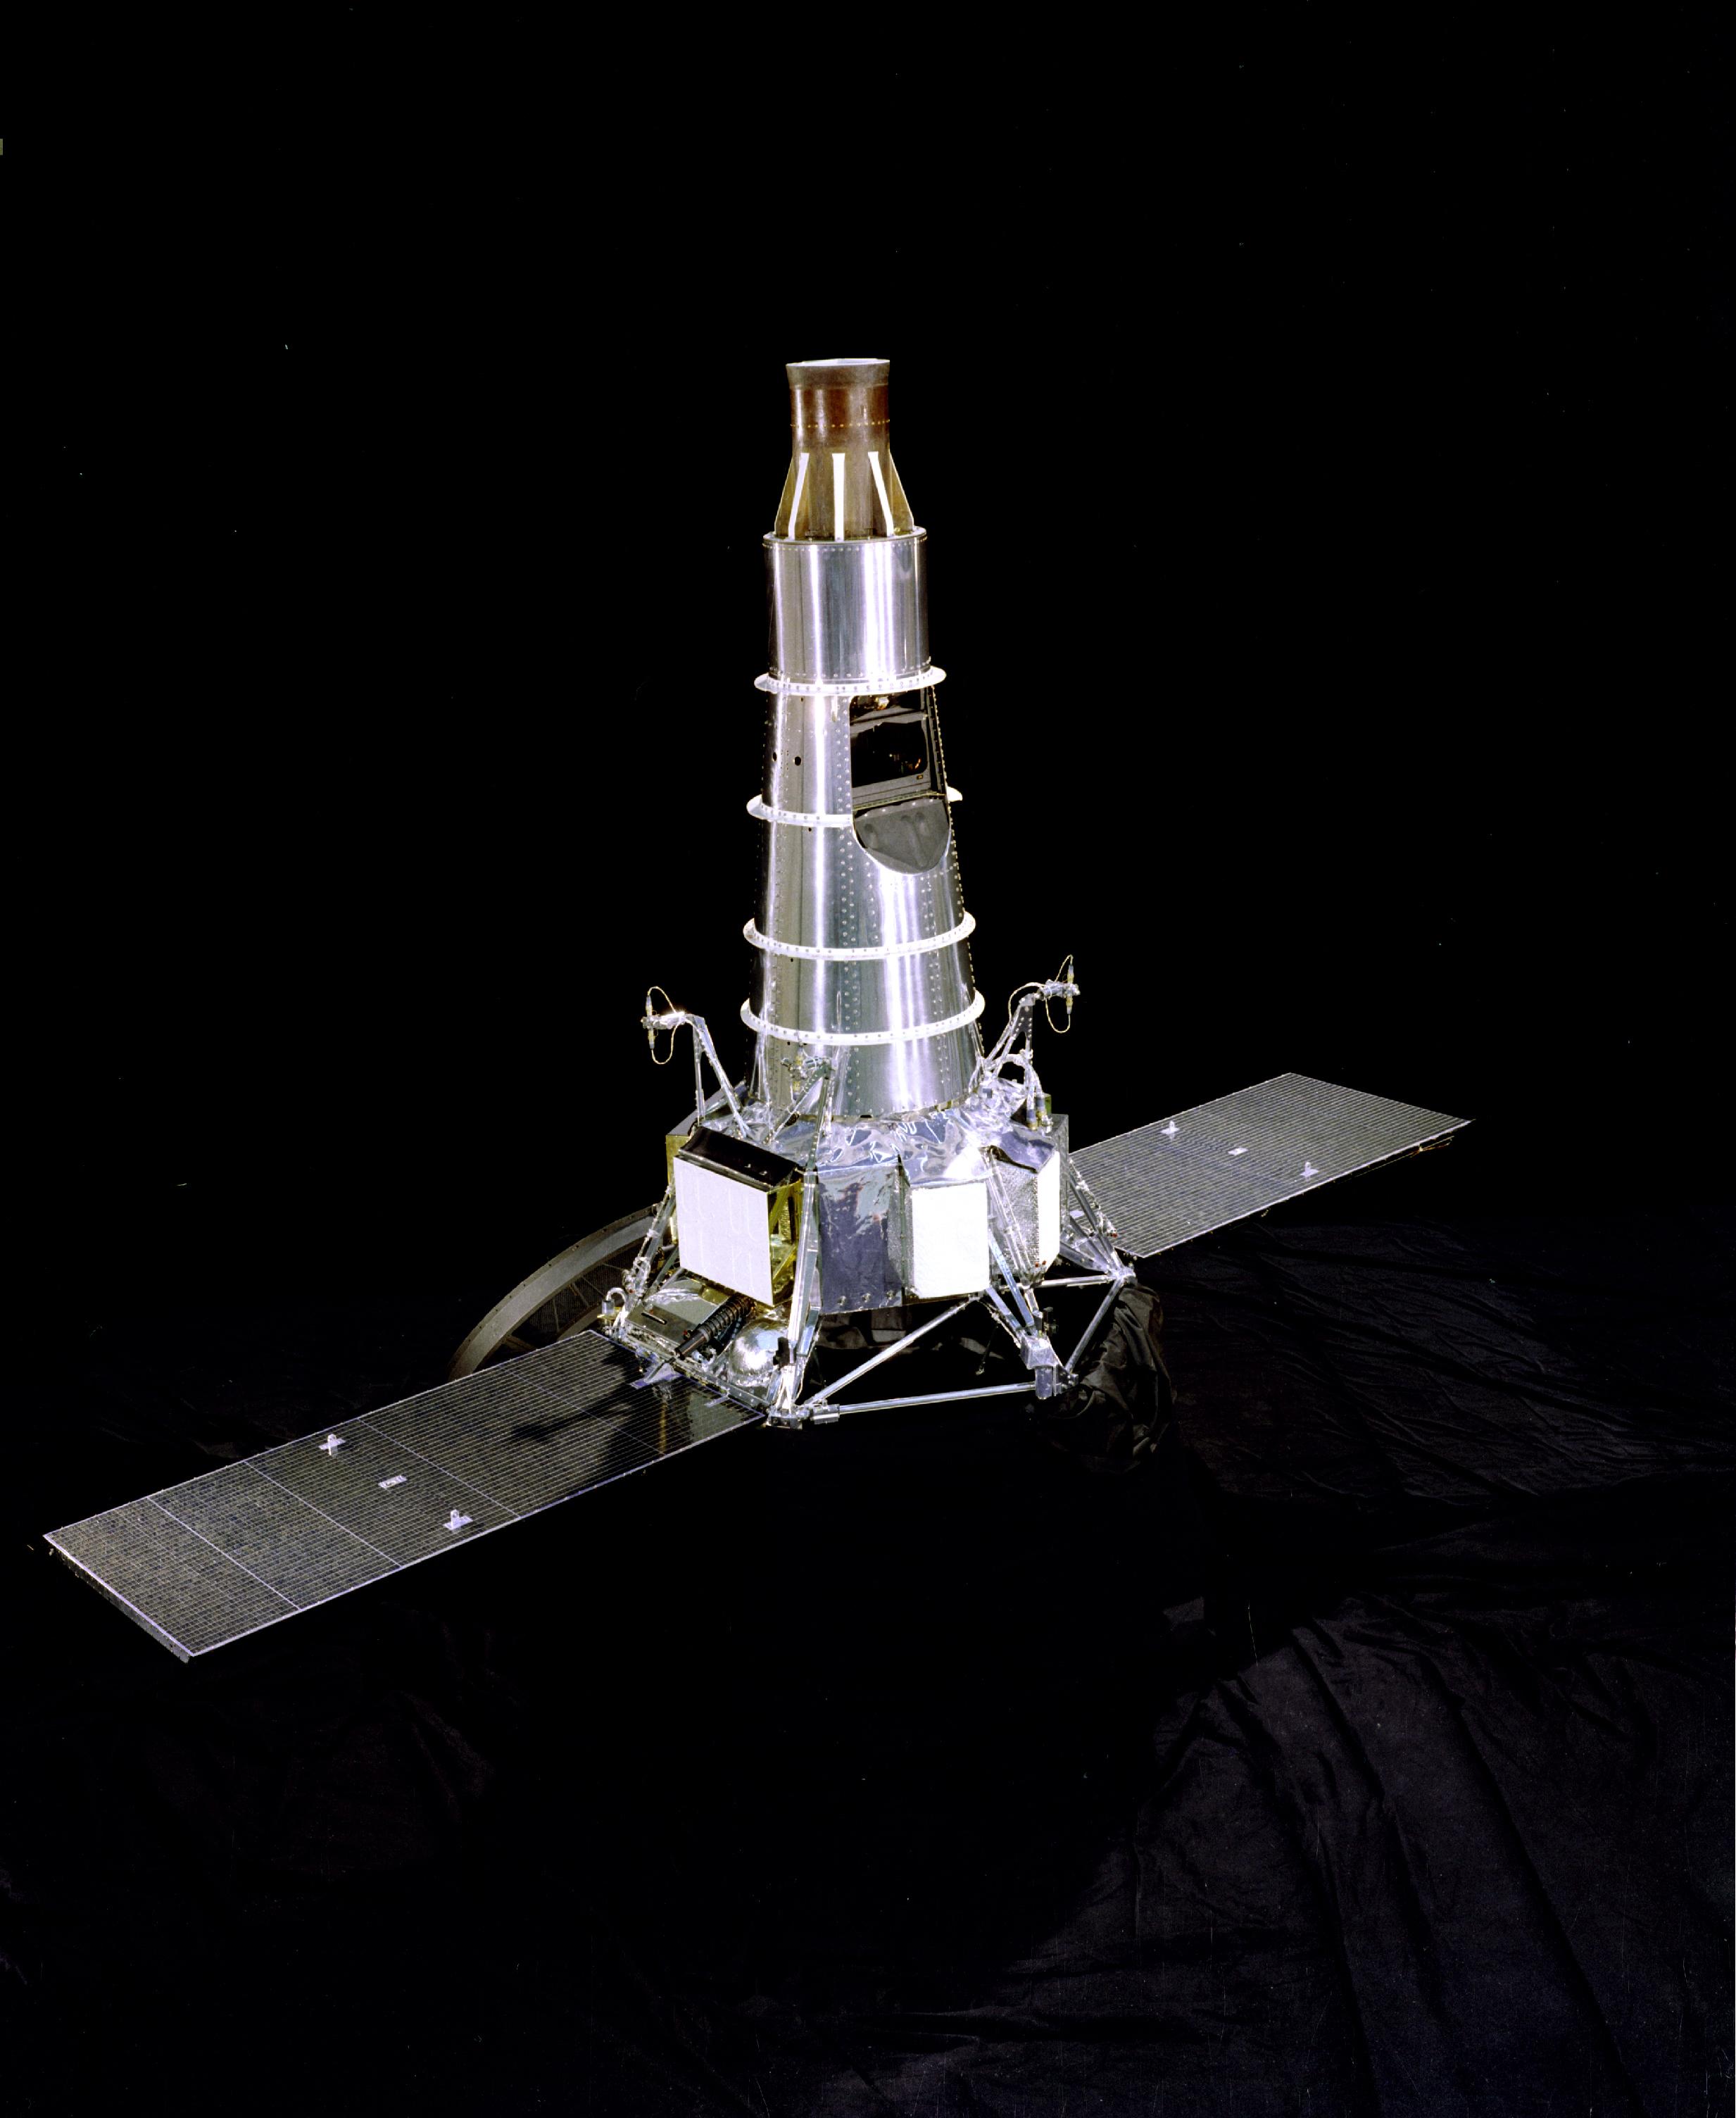 nasa ranger spacecraft - HD2466×3008